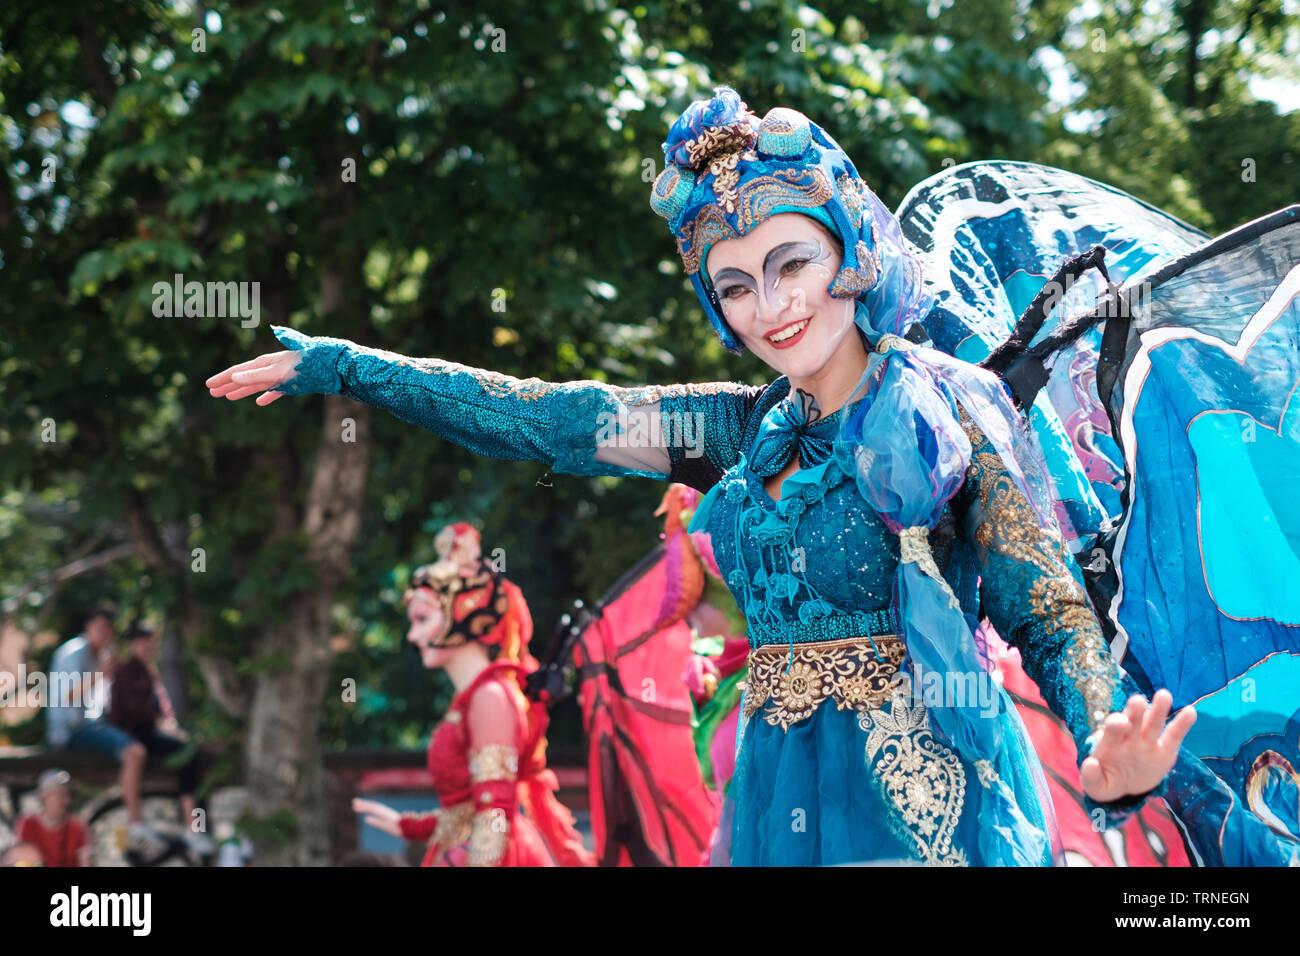 Berlin, Germany - june 2019: Girl wearing costume, celbrating  Karneval der Kulturen (Carnival of Cultures) in Berlin - Stock Image